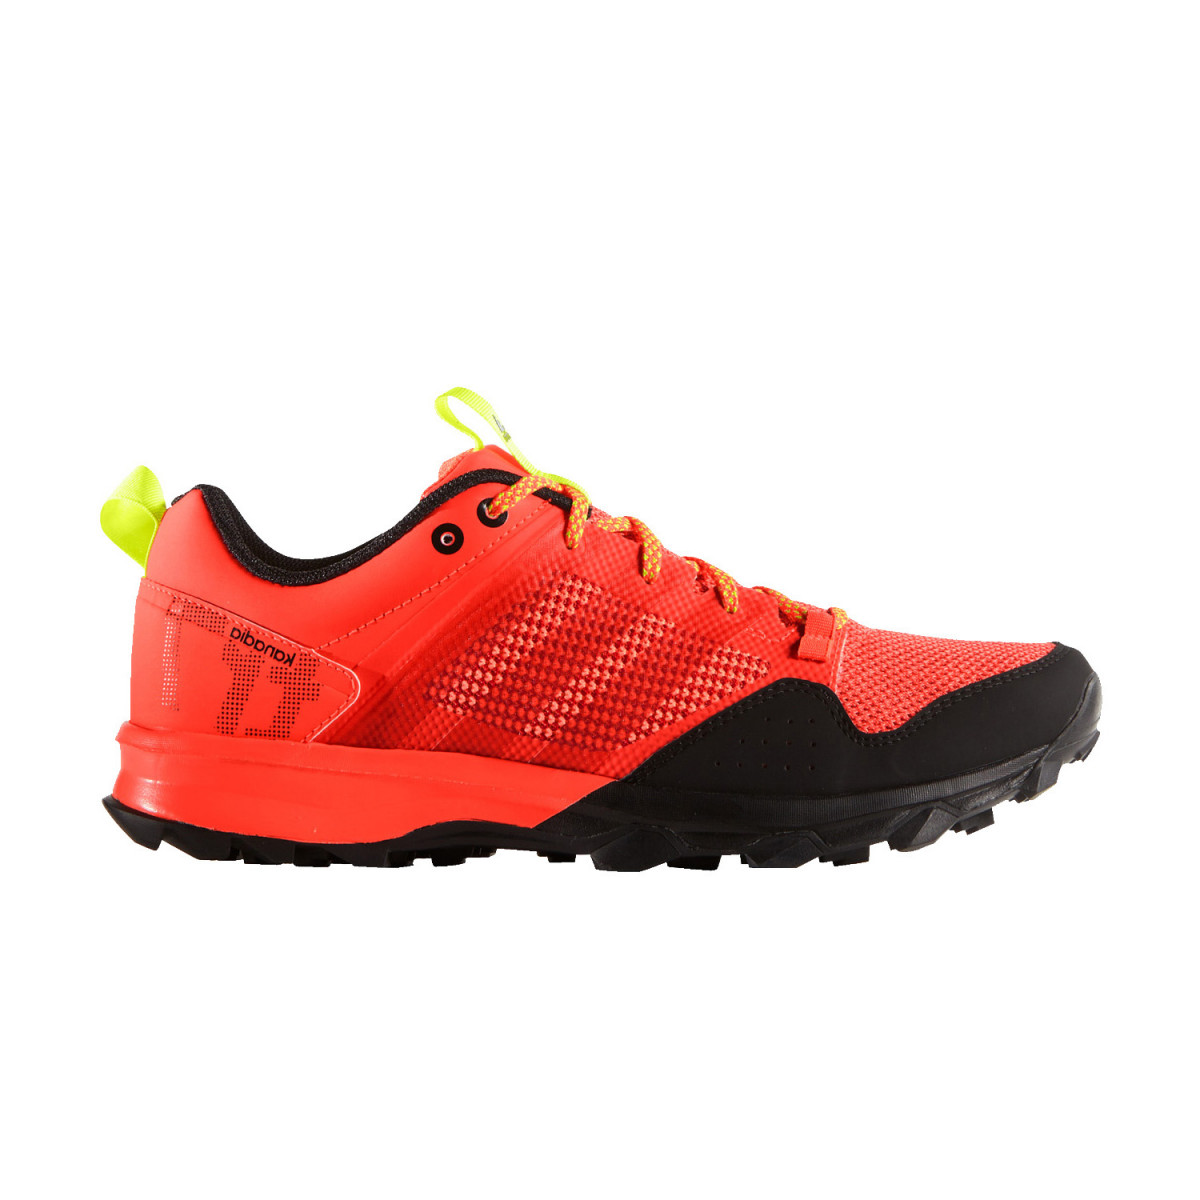 Zapatillas Adidas Kanadia 7 Tr